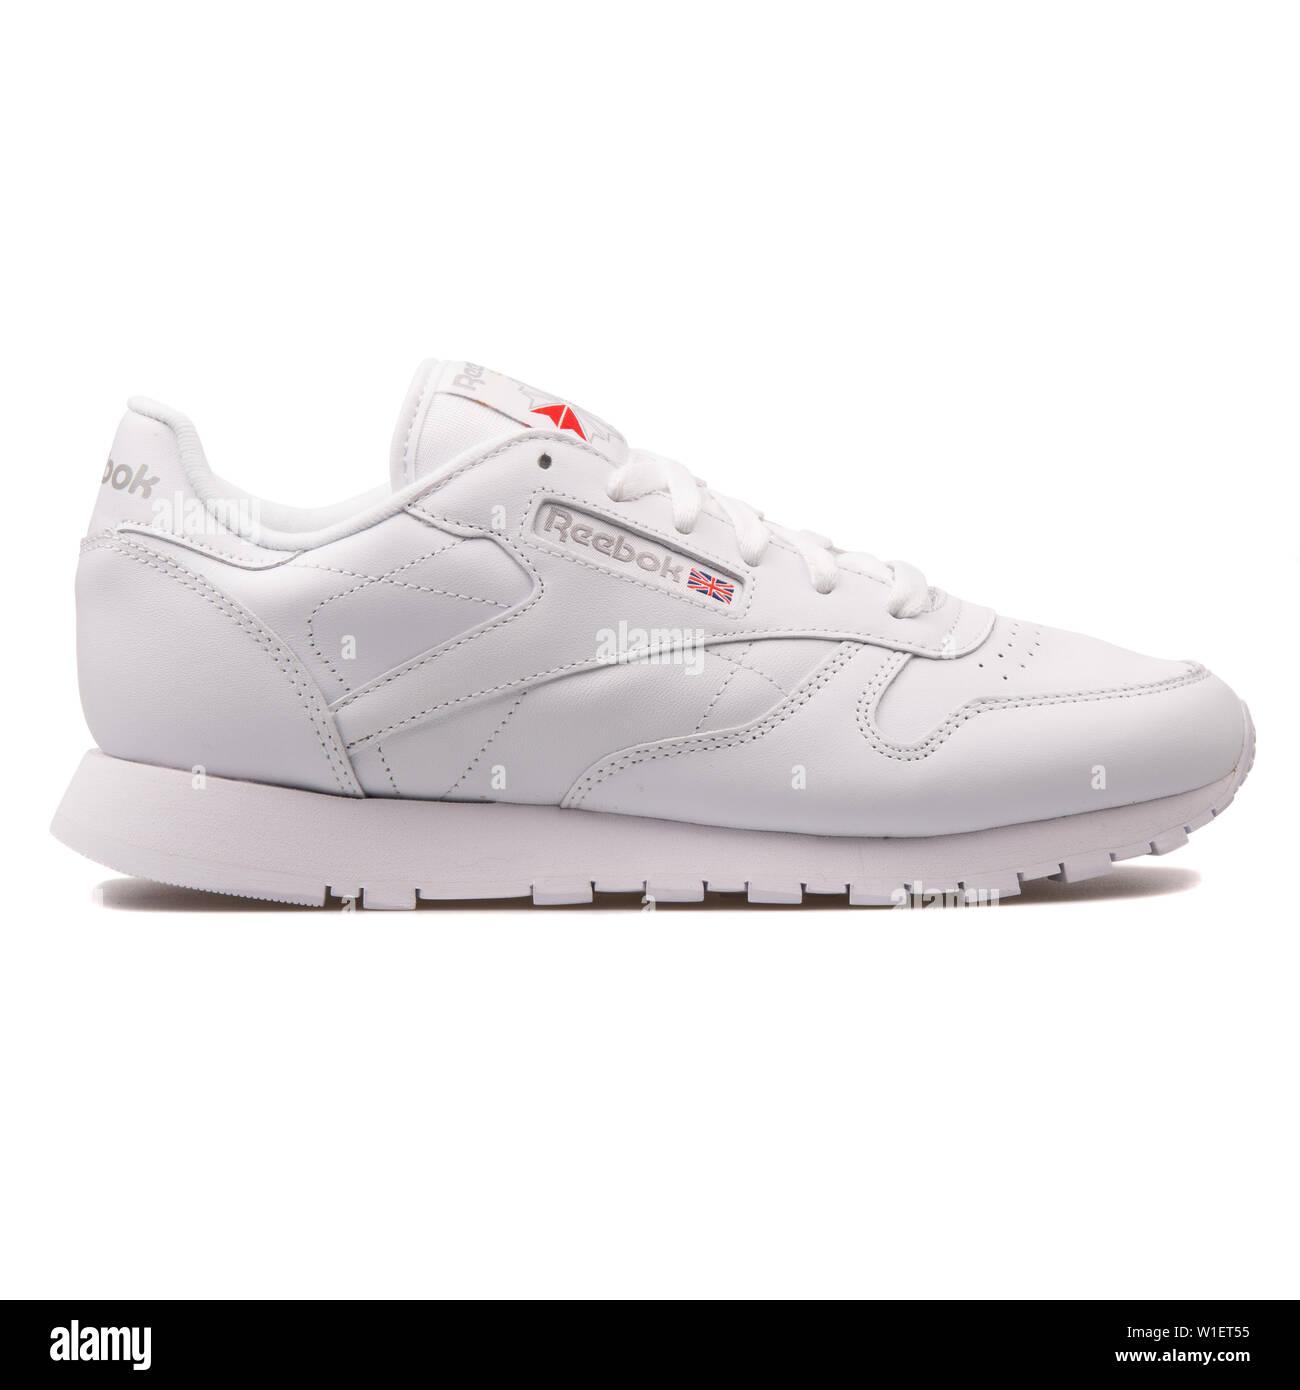 340a26fb VIENNA, AUSTRIA - AUGUST 10, 2017: Reebok Classic Leather white sneaker on  white